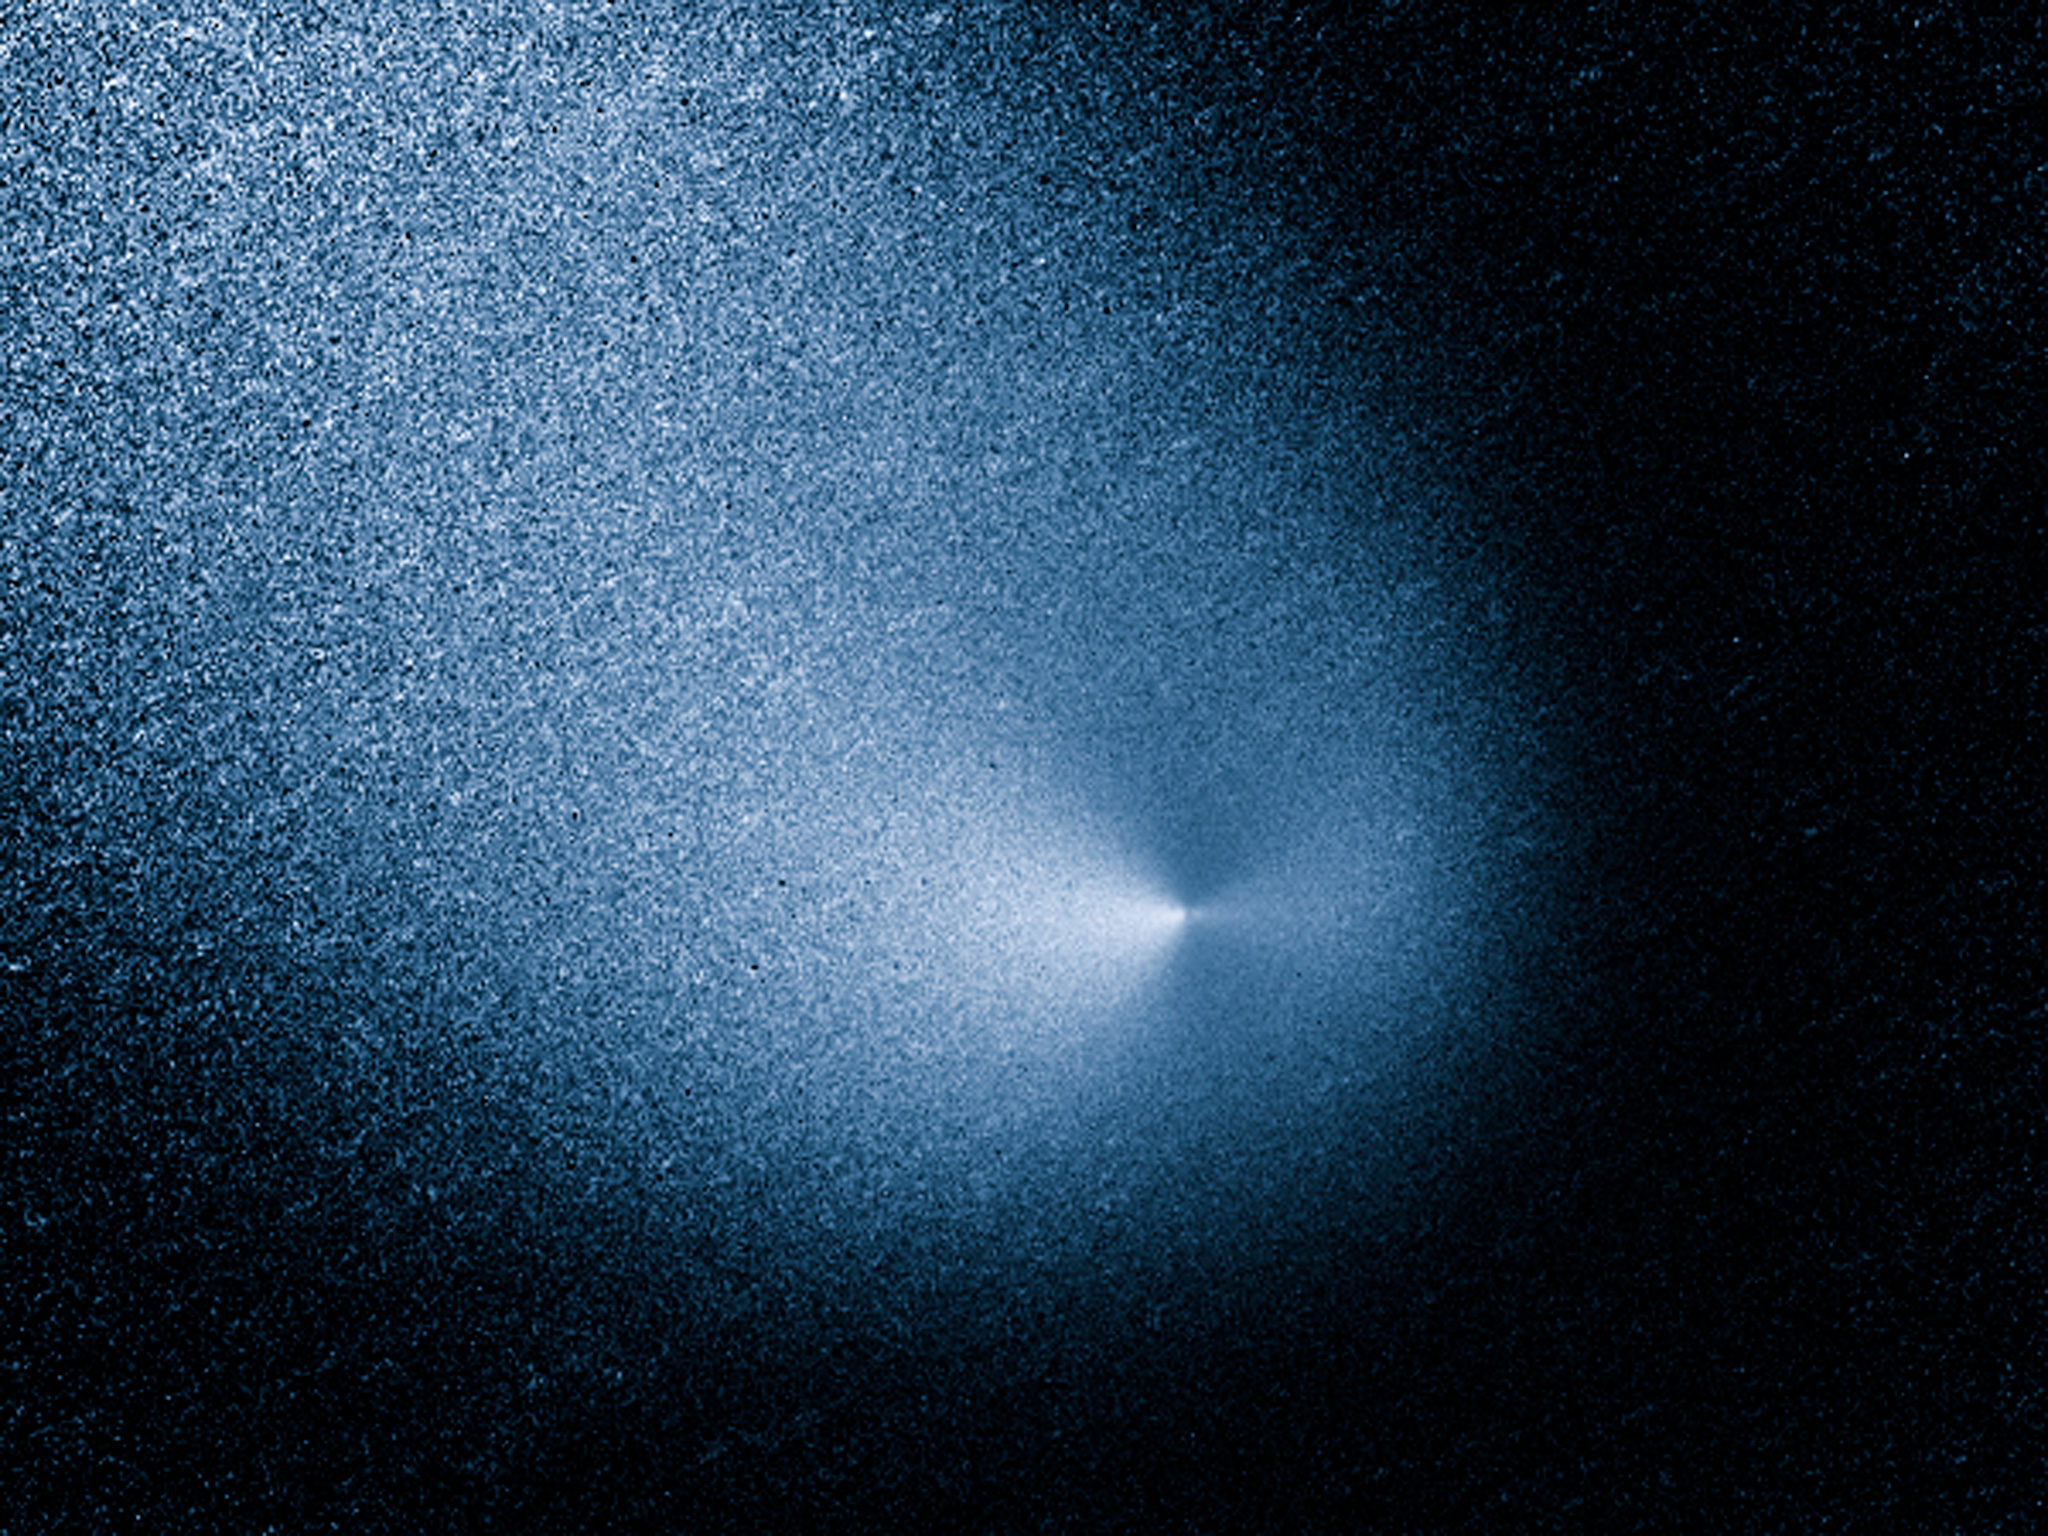 Comet Siding Spring Esa Hubble